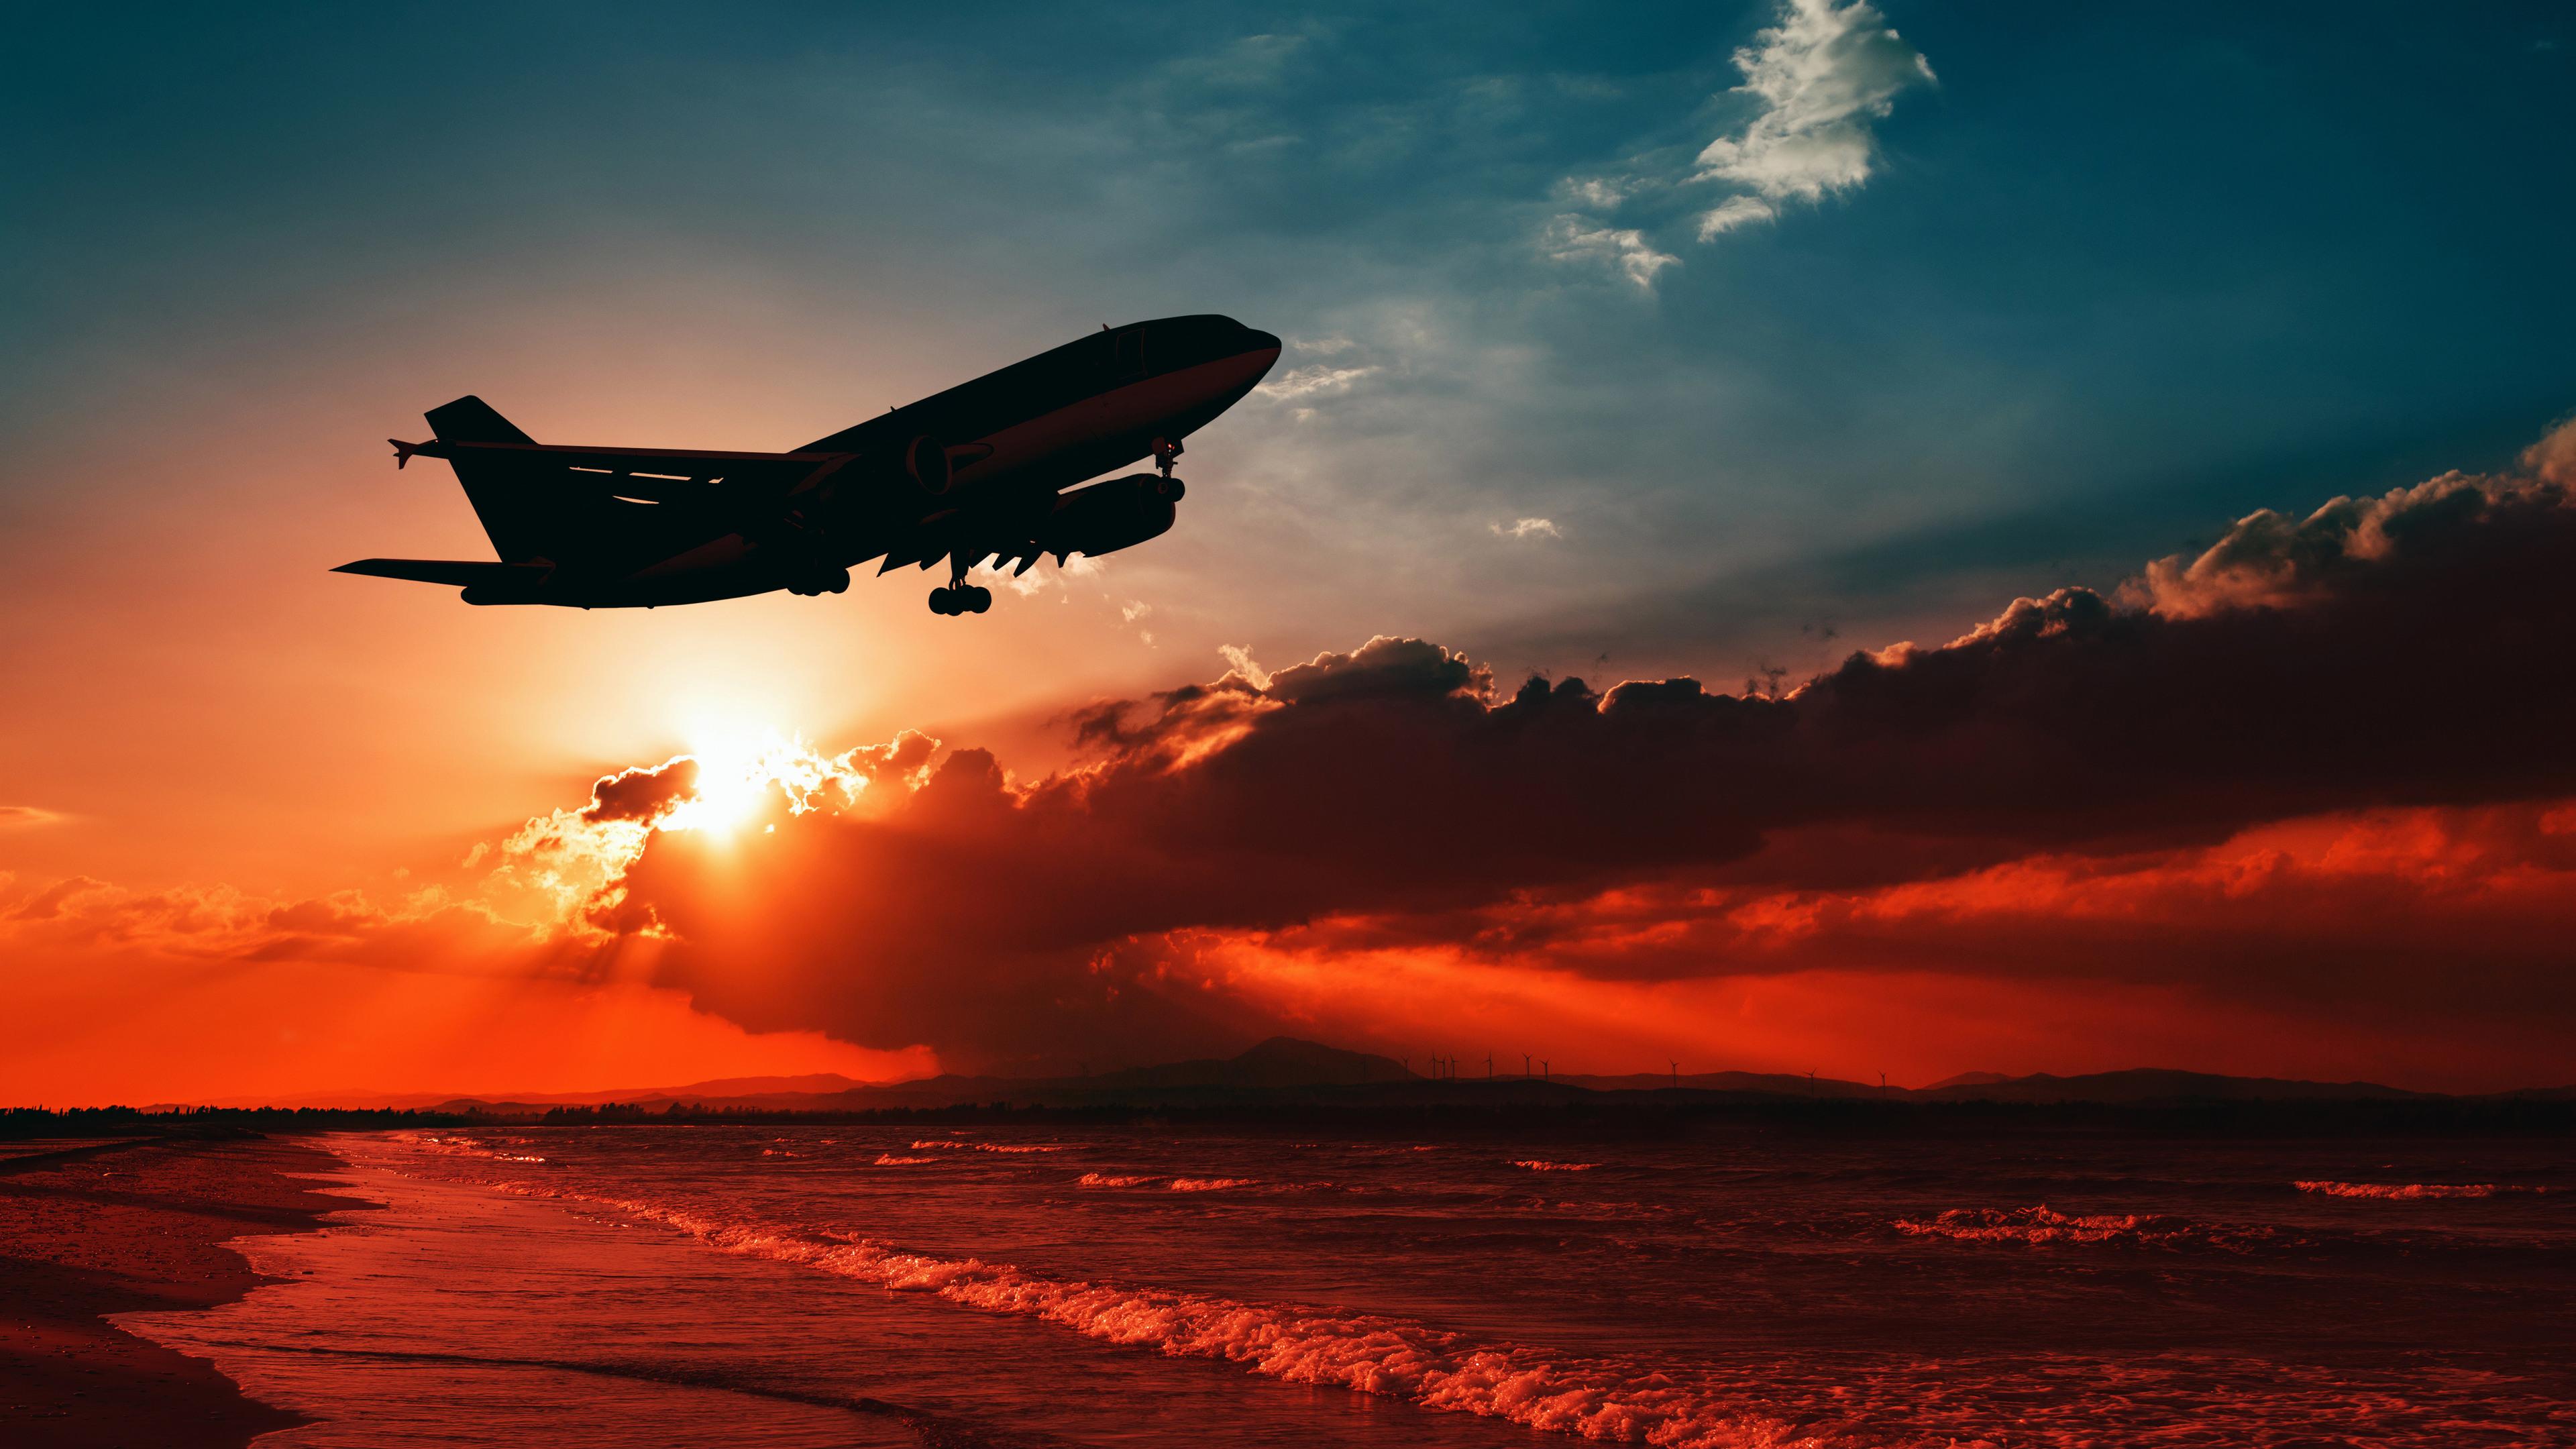 airplane flying over beach shore sunset 4k 1547938028 - Airplane Flying Over Beach Shore Sunset 4k - sunset wallpapers, shore wallpapers, planes wallpapers, photography wallpapers, hd-wallpapers, beach wallpapers, airplane wallpapers, 5k wallpapers, 4k-wallpapers